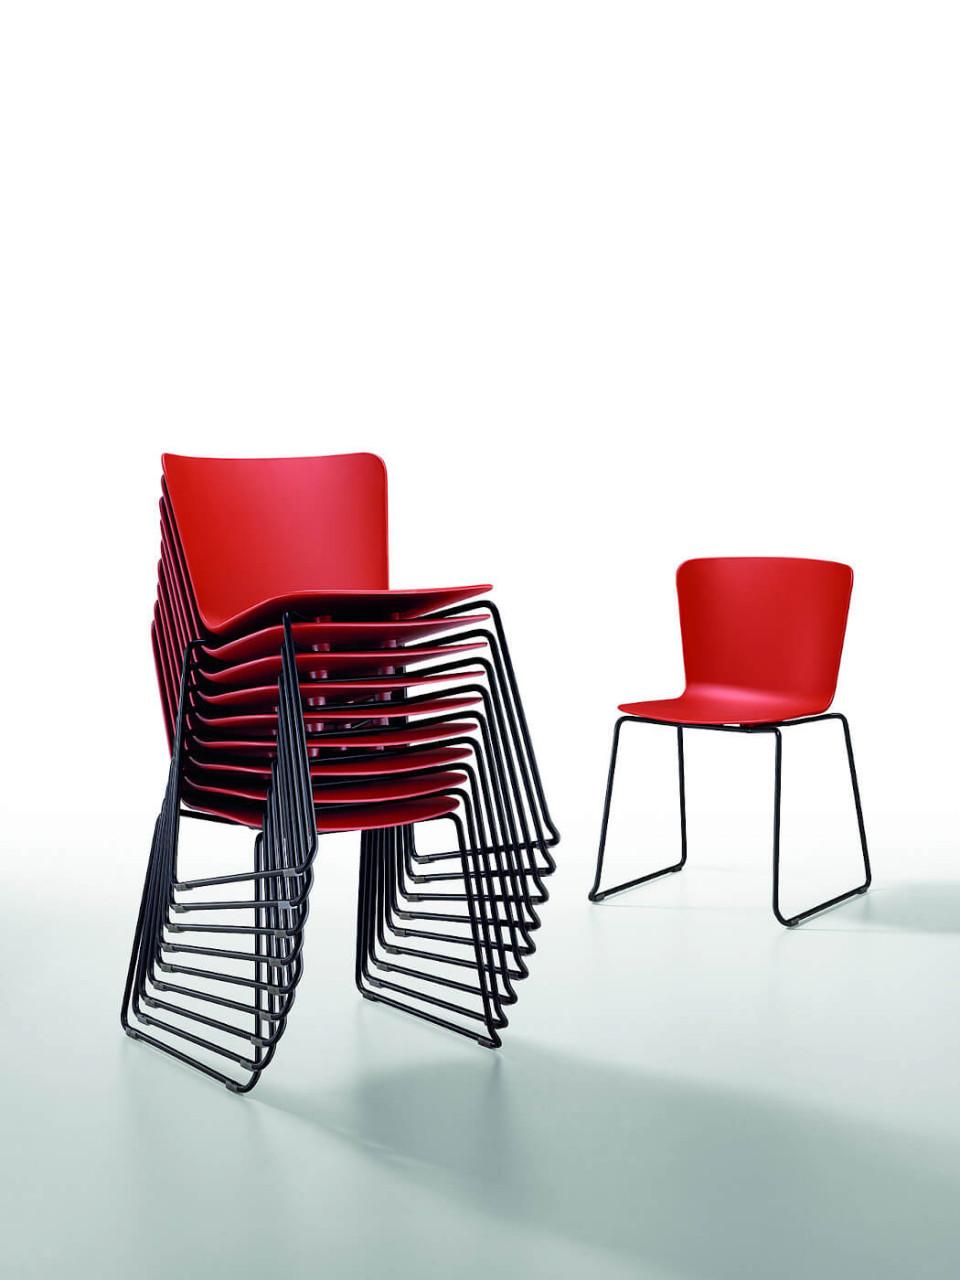 Calla chaise empilable